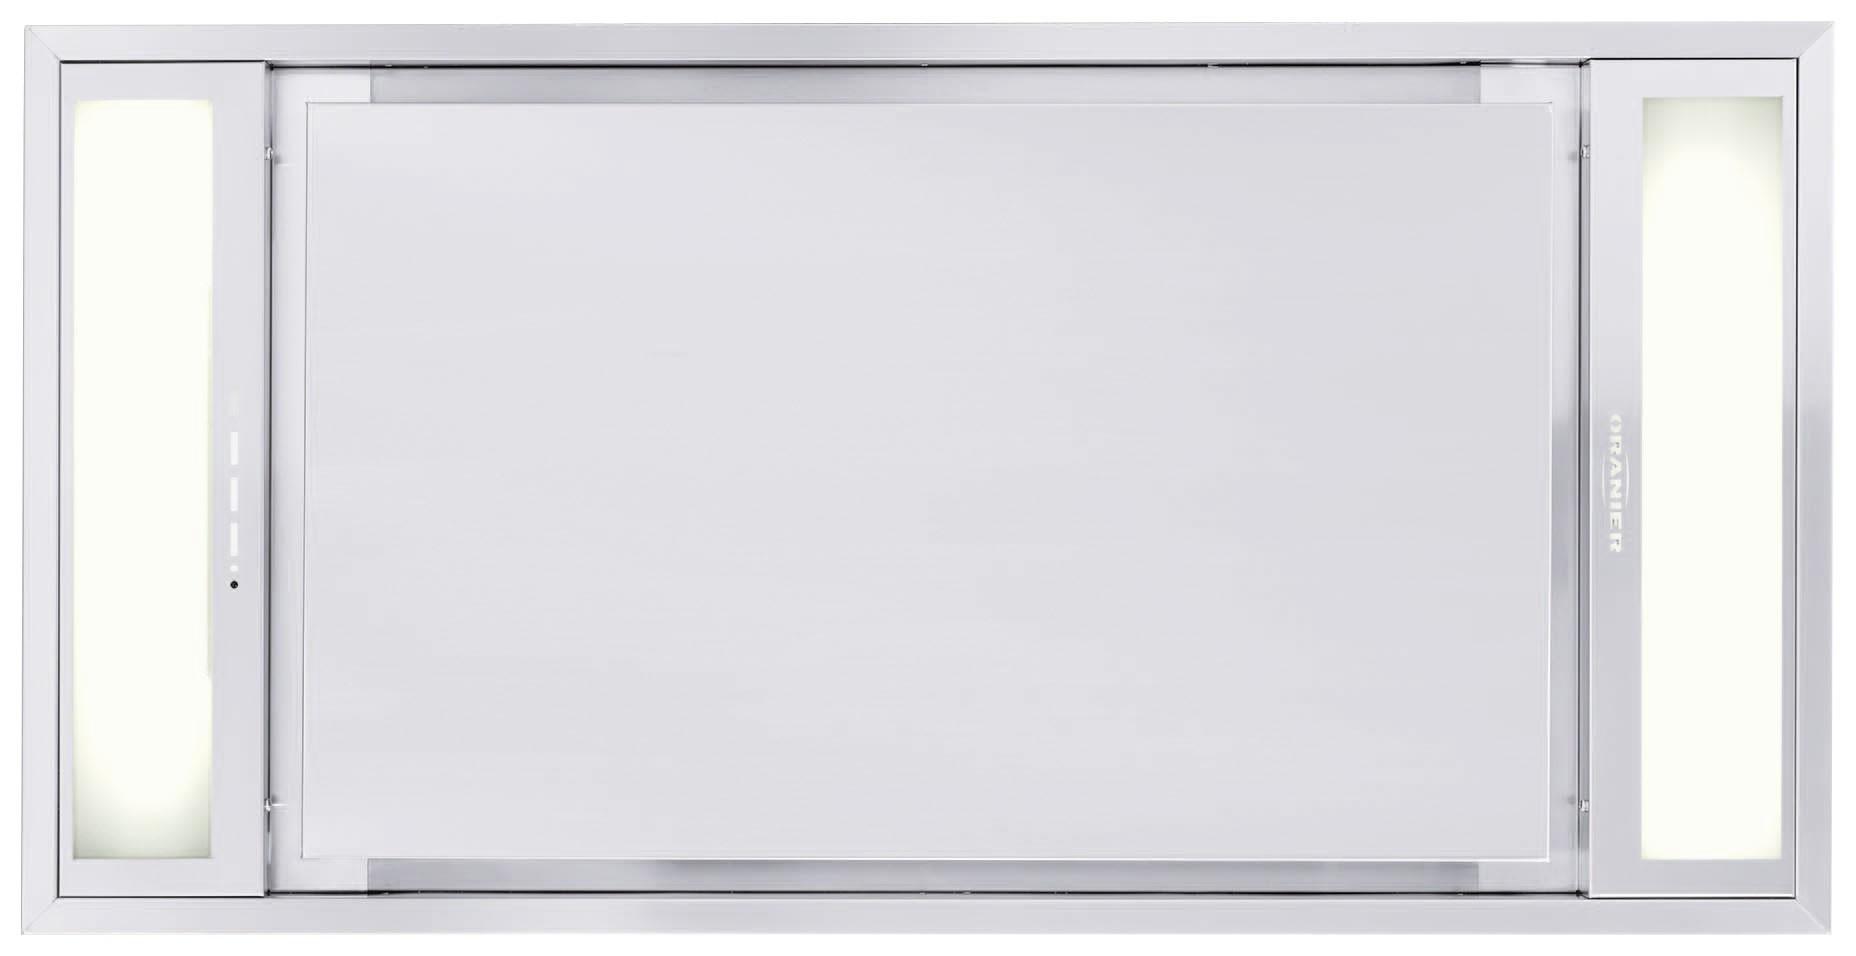 oranier modula deckenhaube dunstabzugshaube 100 cm ebay. Black Bedroom Furniture Sets. Home Design Ideas